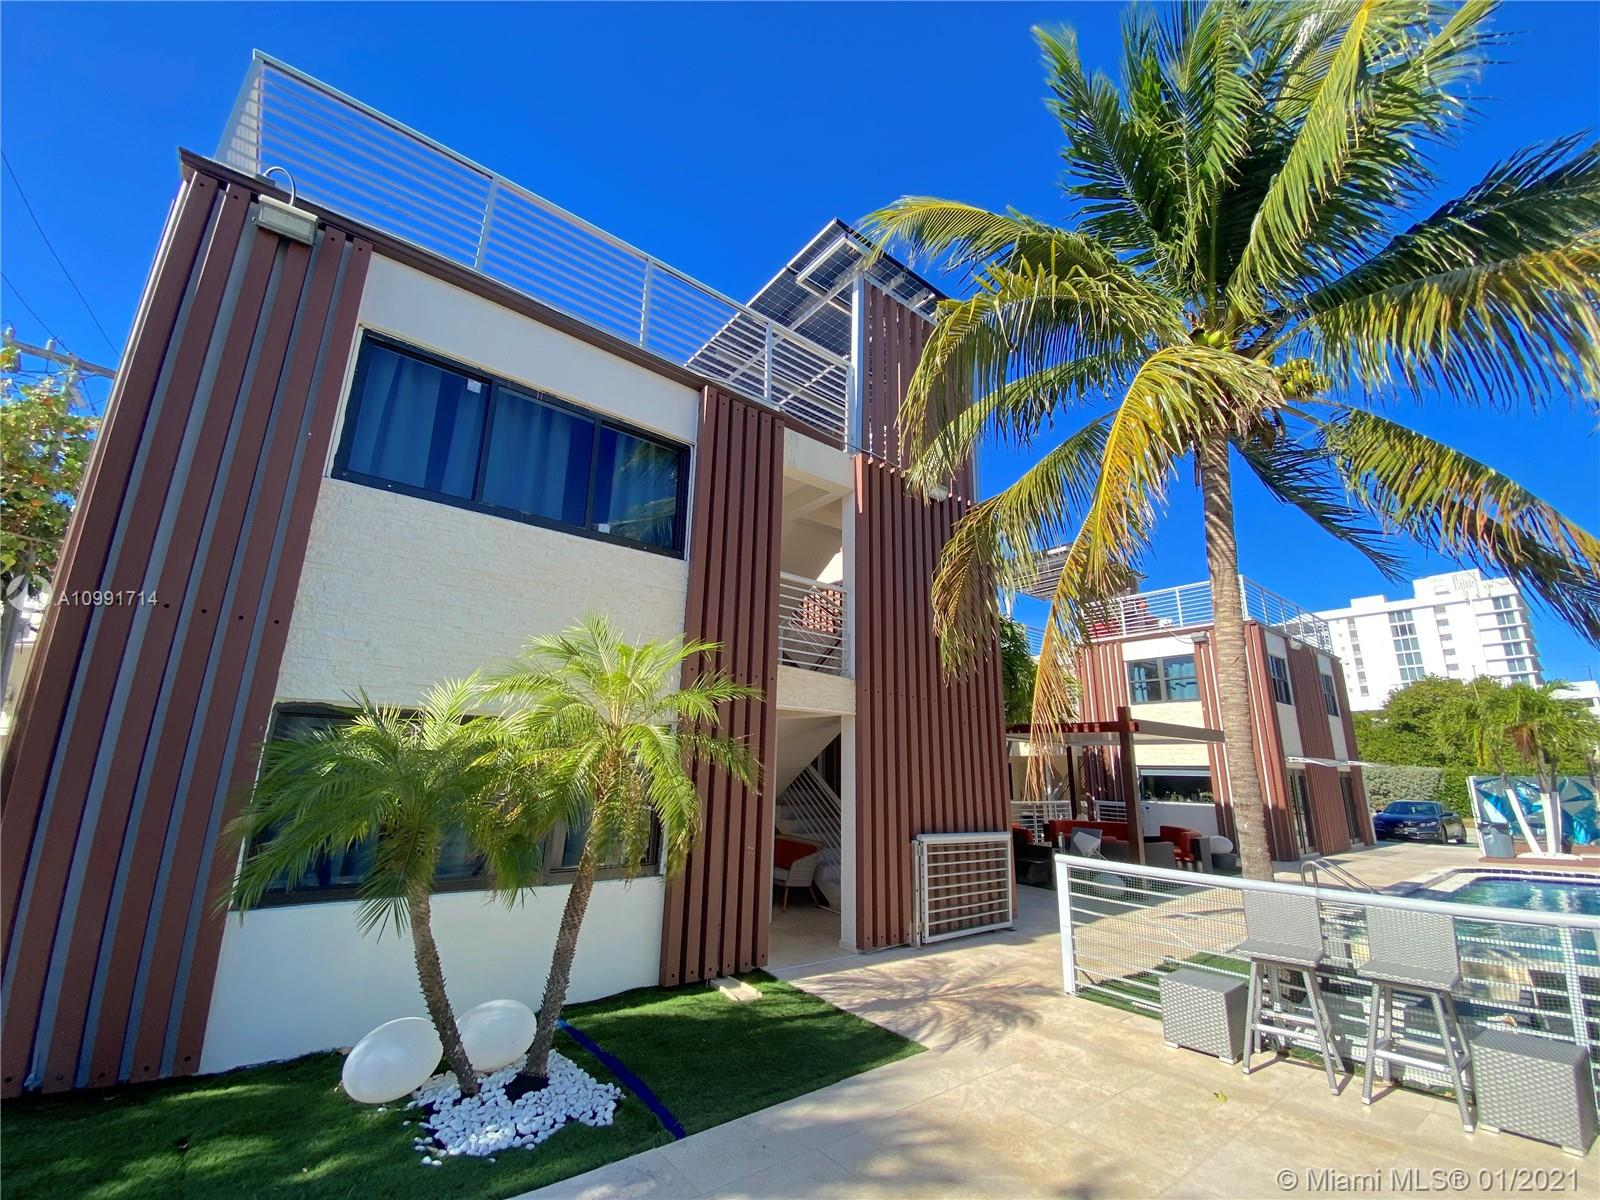 Photo of 3086  Harbor Dr, Fort Lauderdale, FL 33316